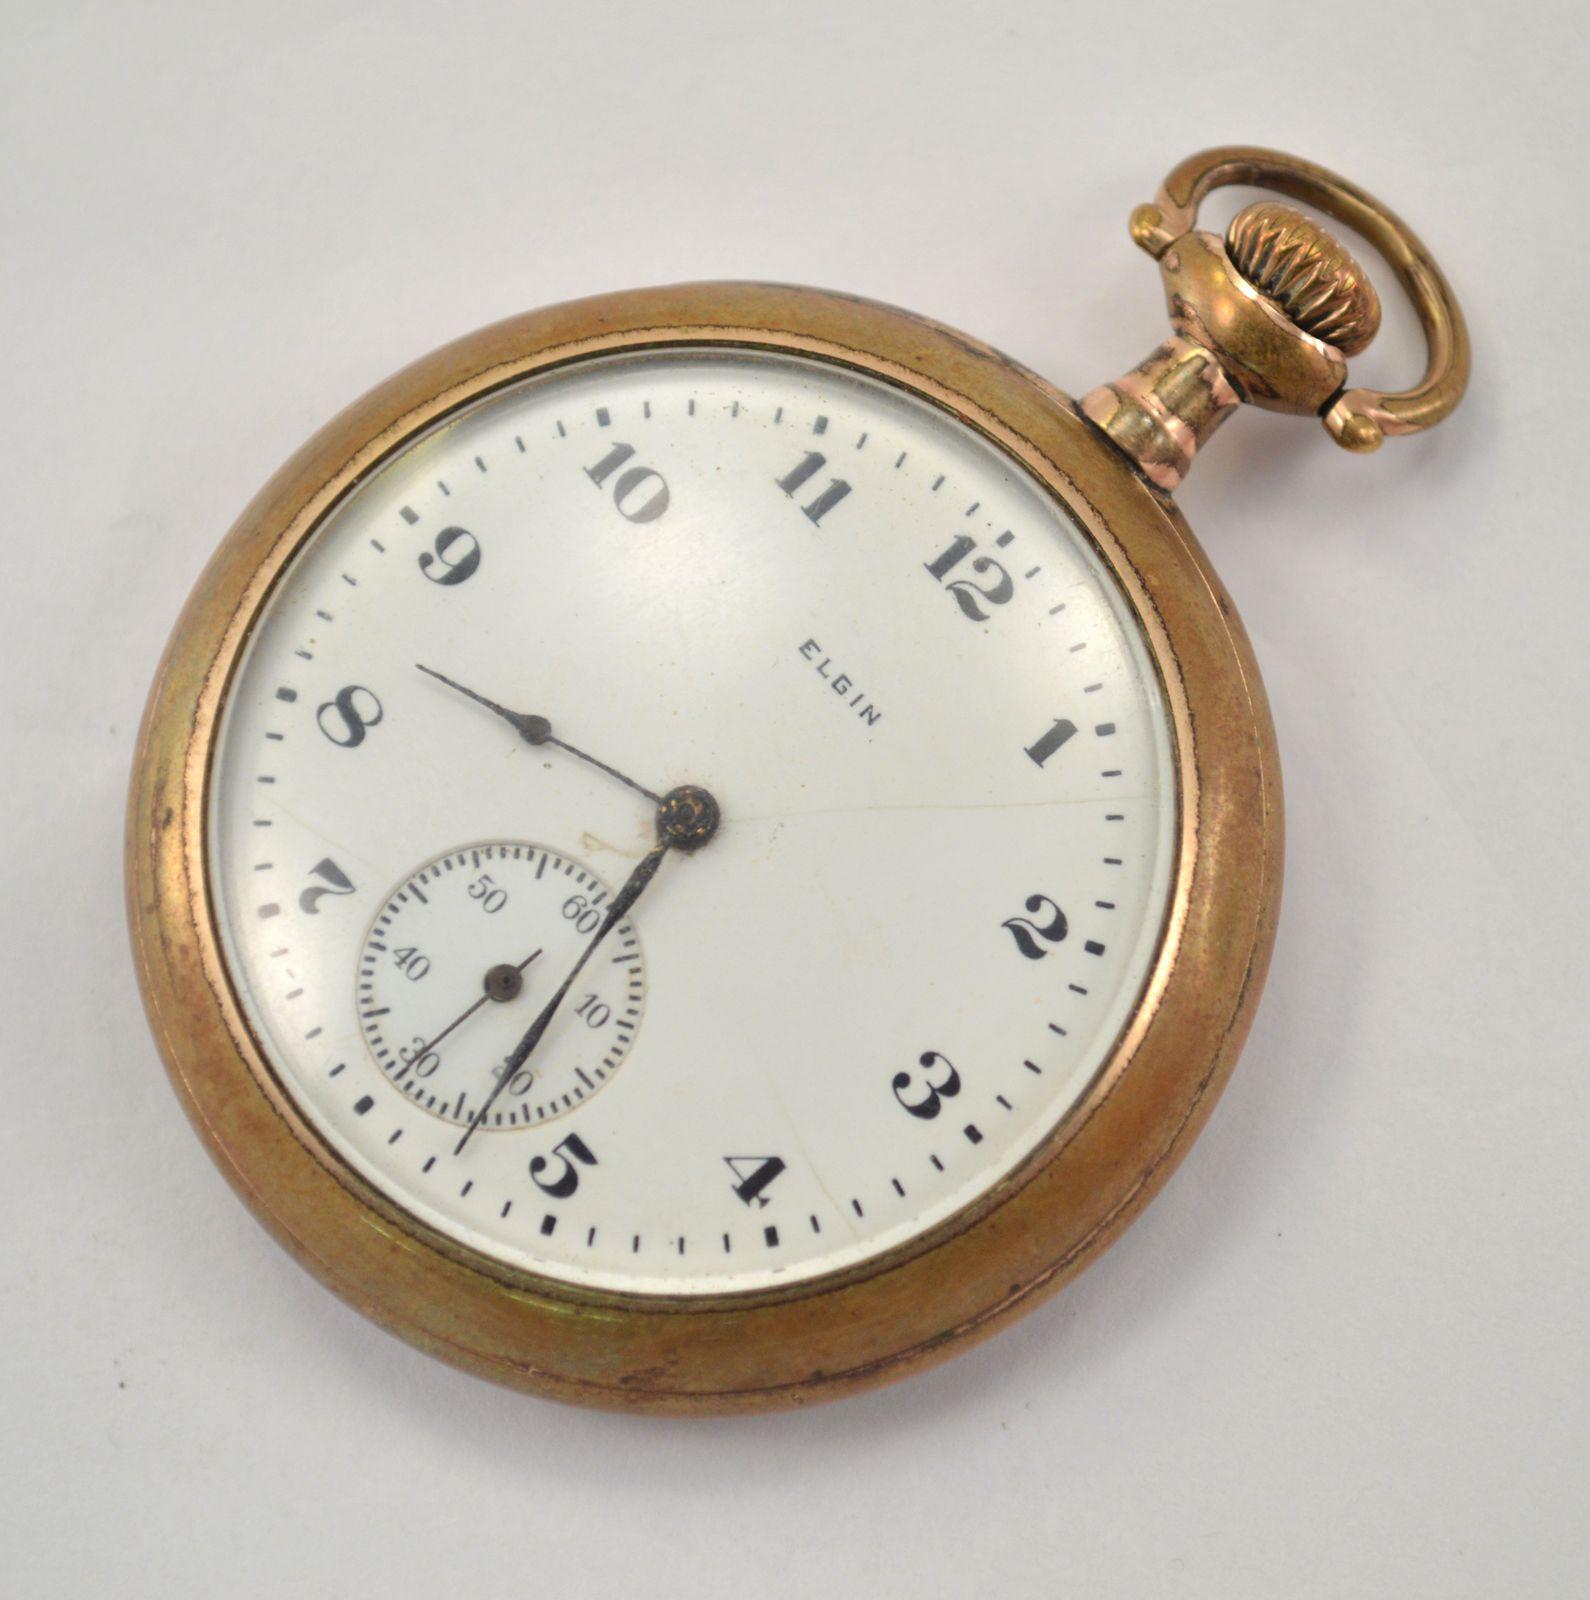 1921 Elgin Pocket Watch 16 Size 7 Jewel Property Room